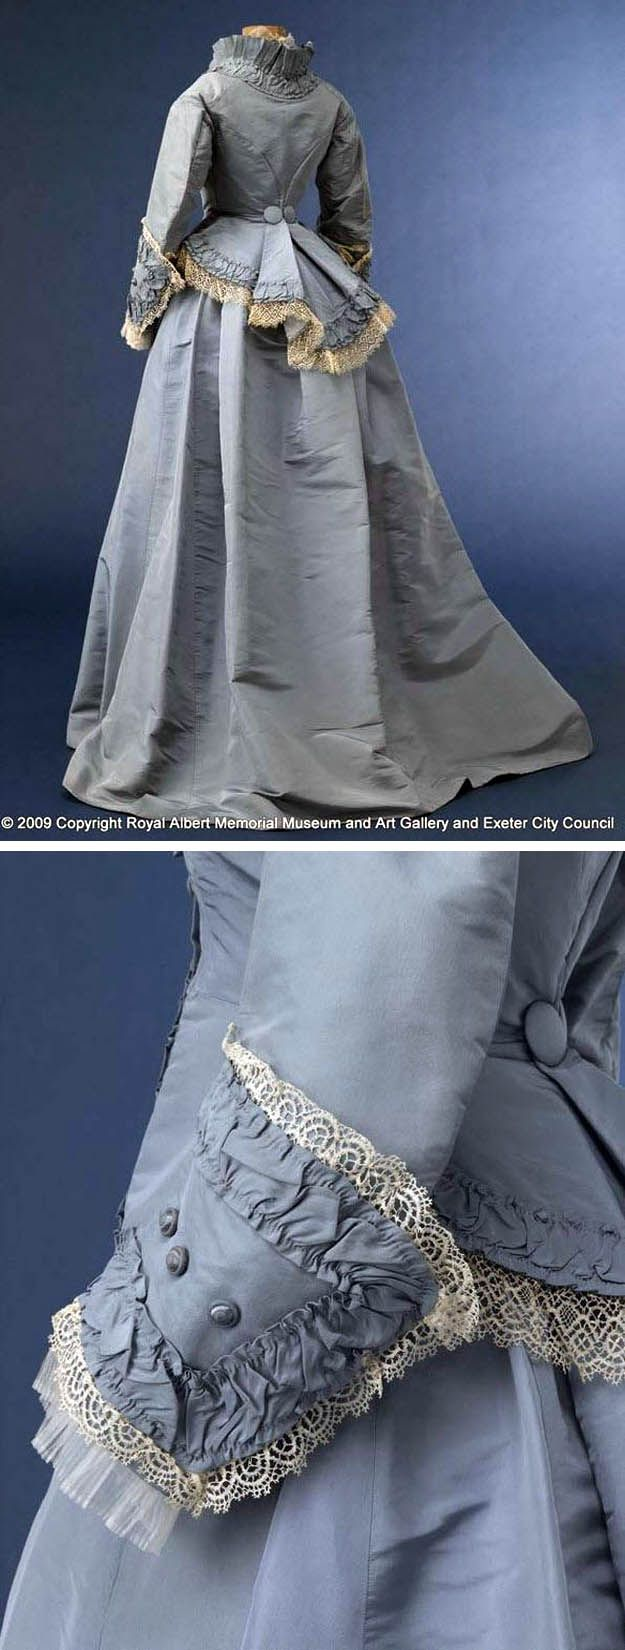 18th century wedding dress   best Fashion  Vintage  before  images on Pinterest